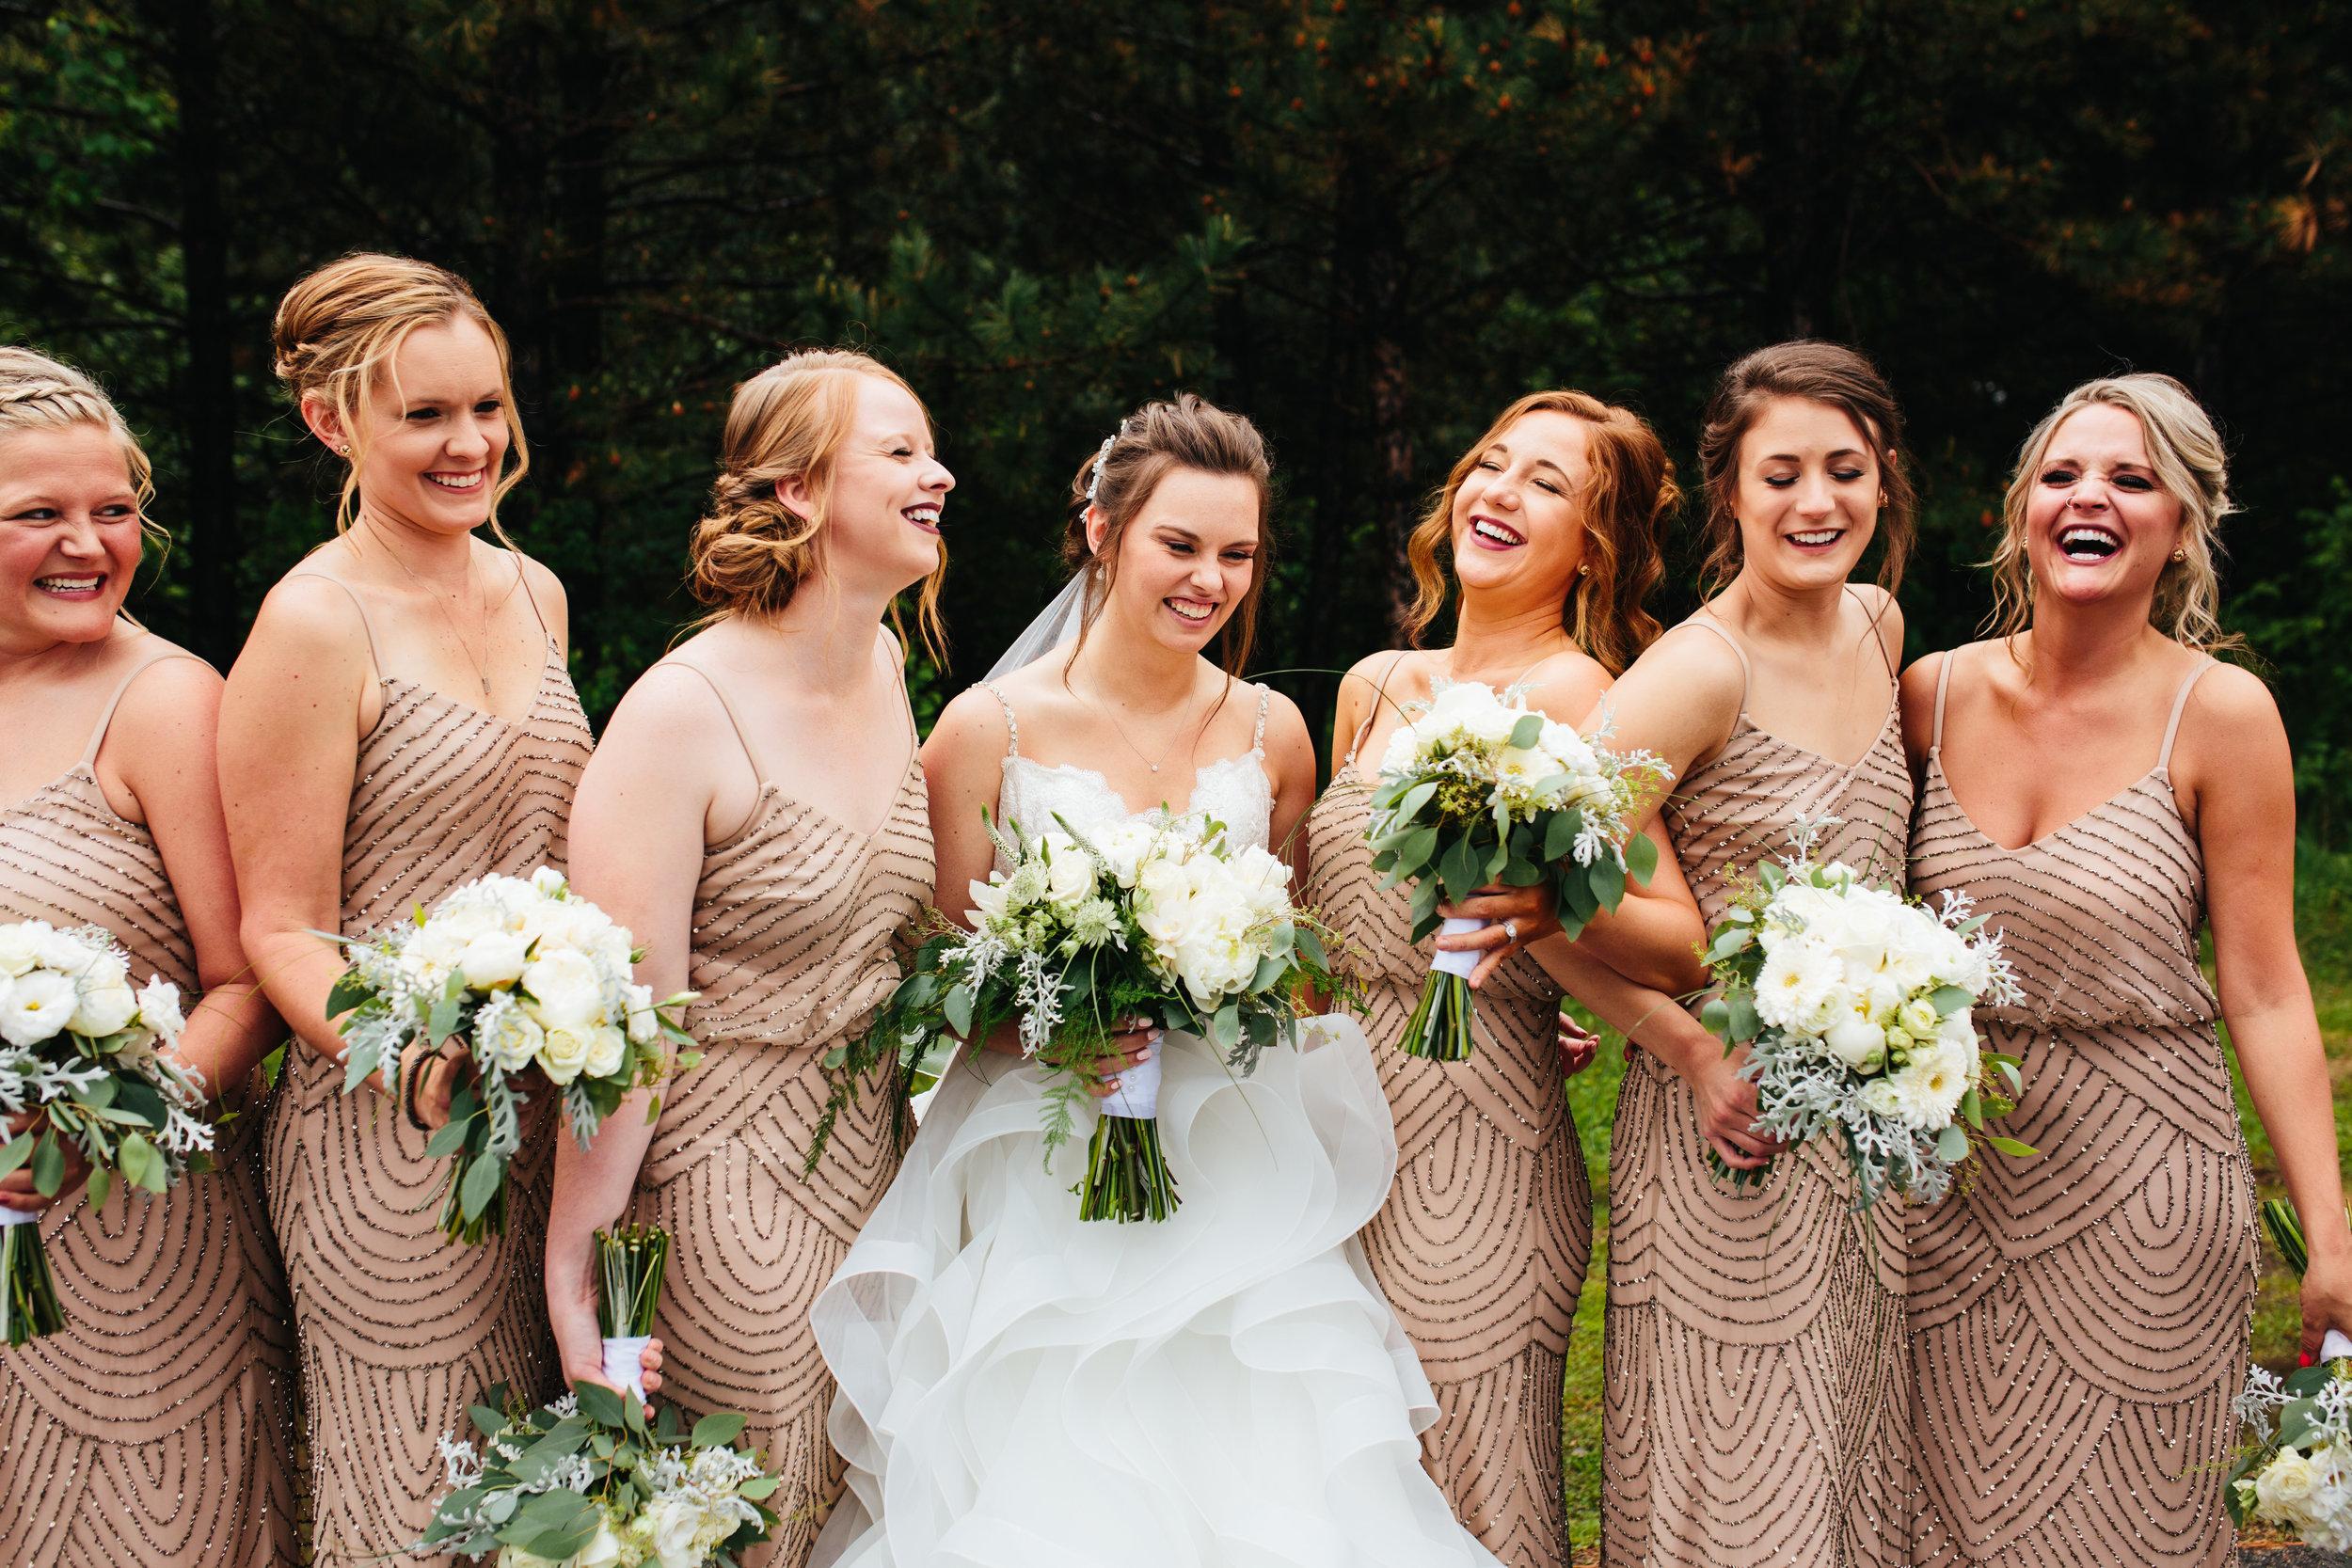 kristina_derek_weddingparty-71.jpg